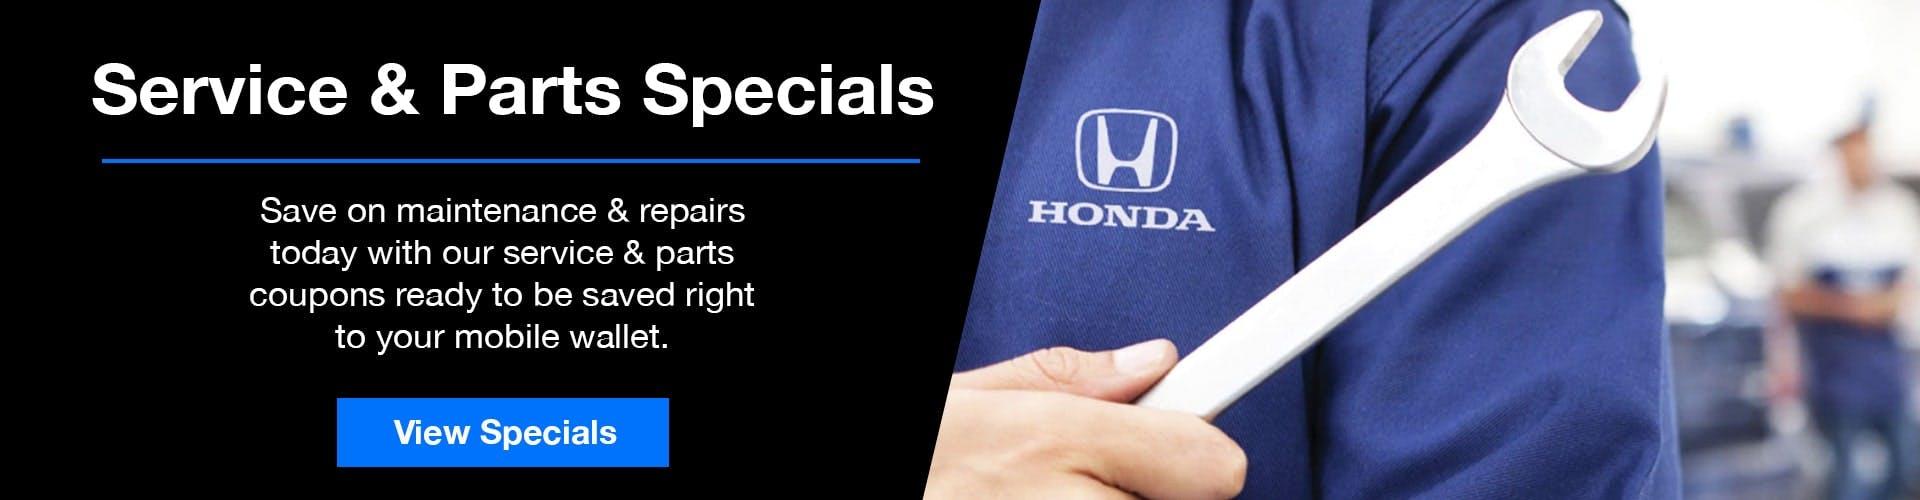 Honda Homepage Banner